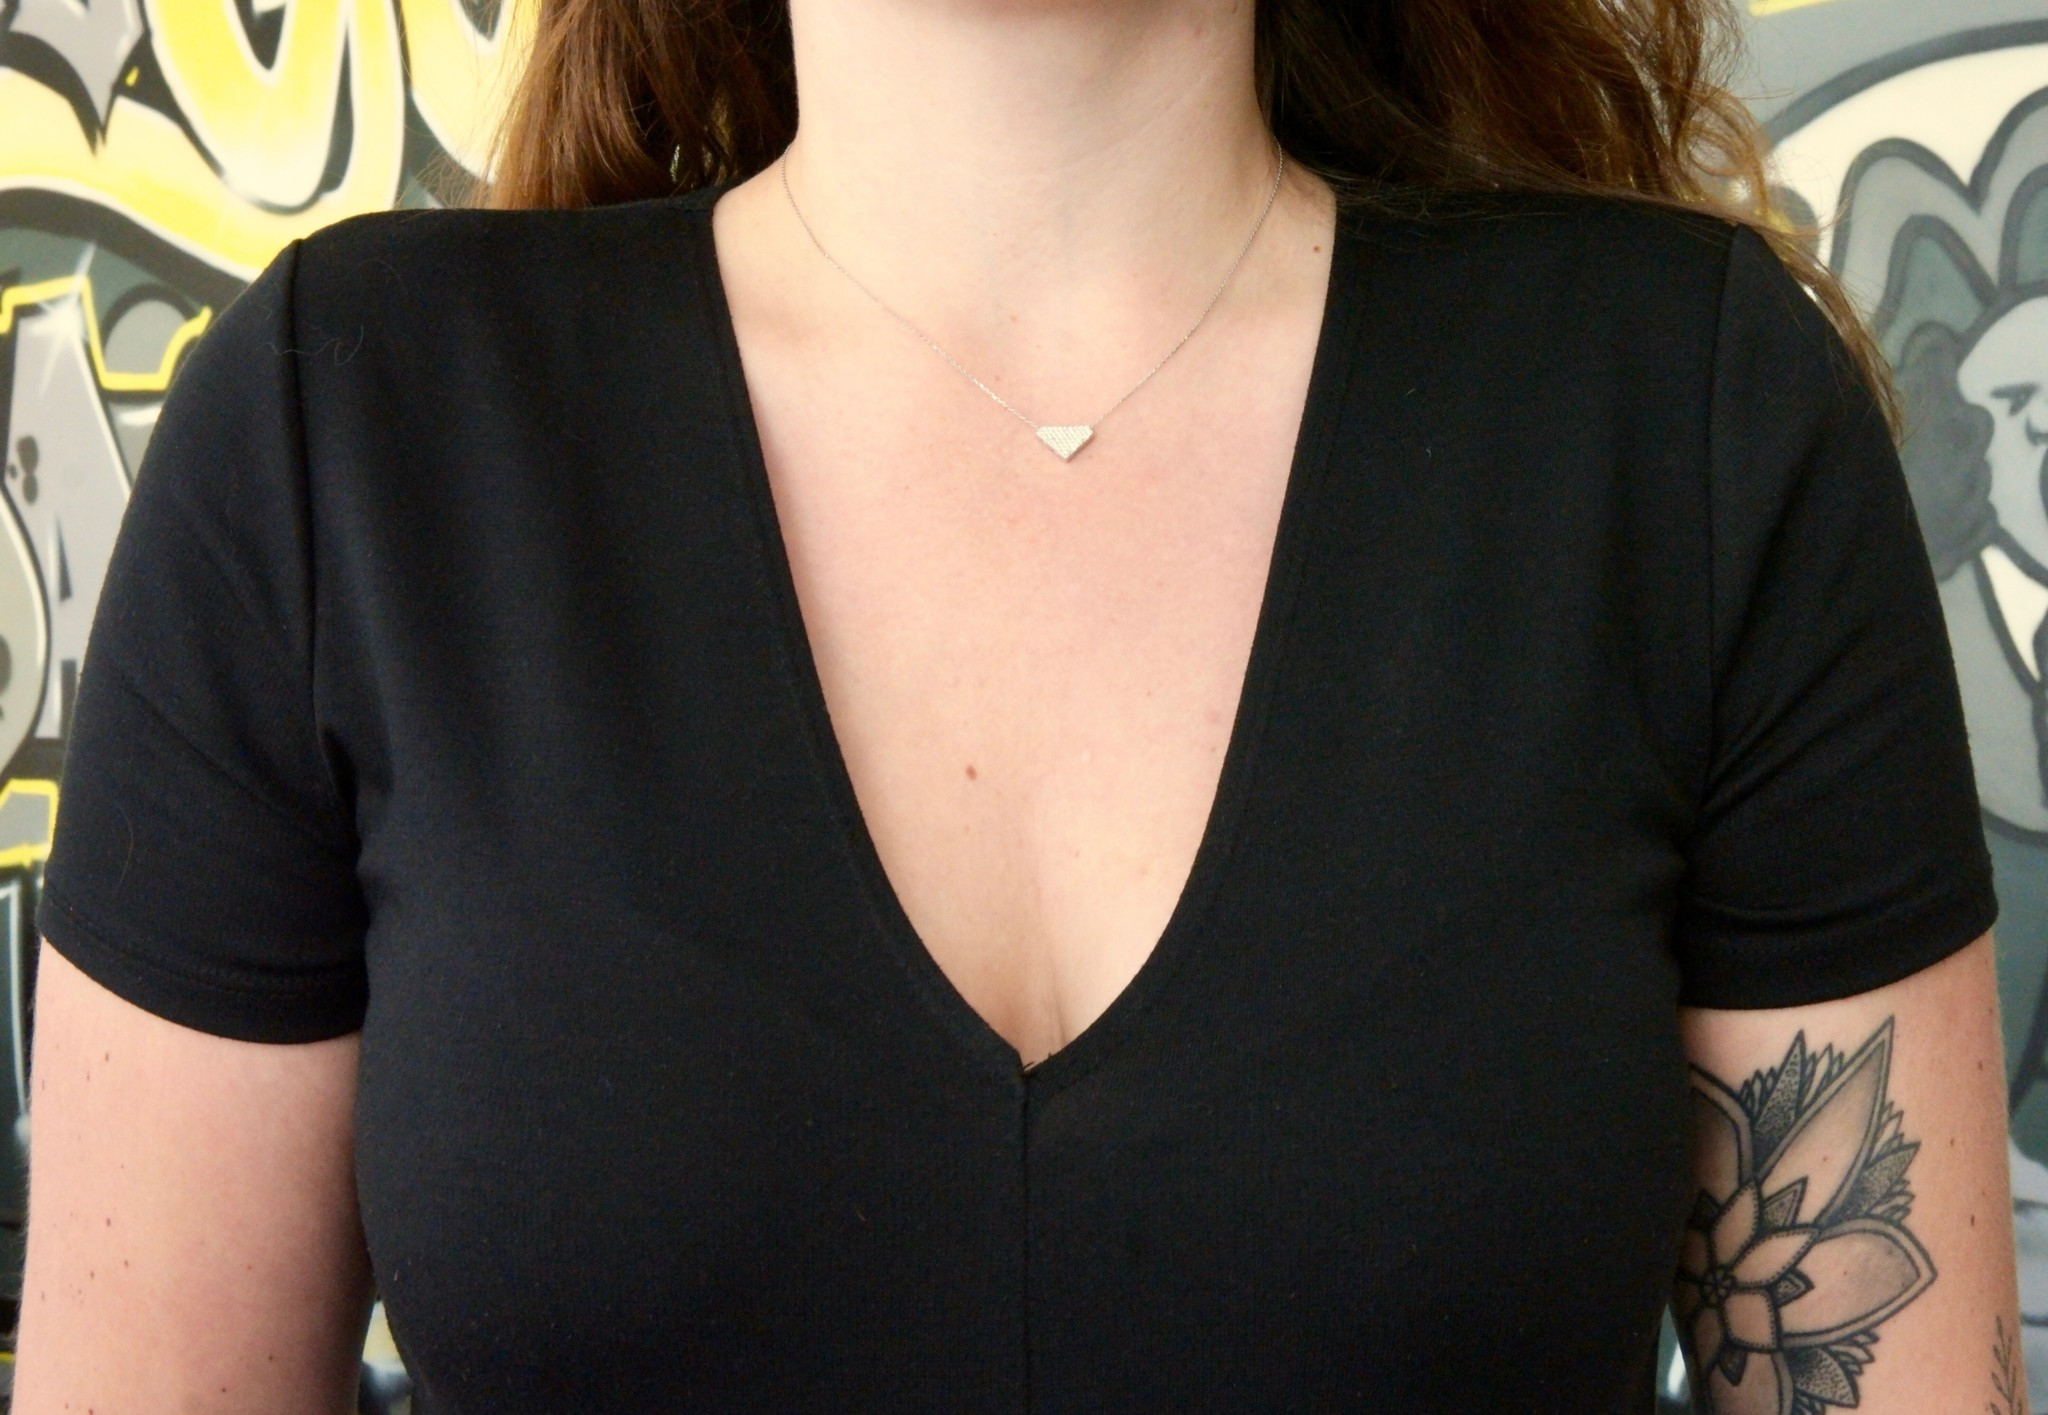 Ketting met vaste hanger diamantvorm witgoud-2